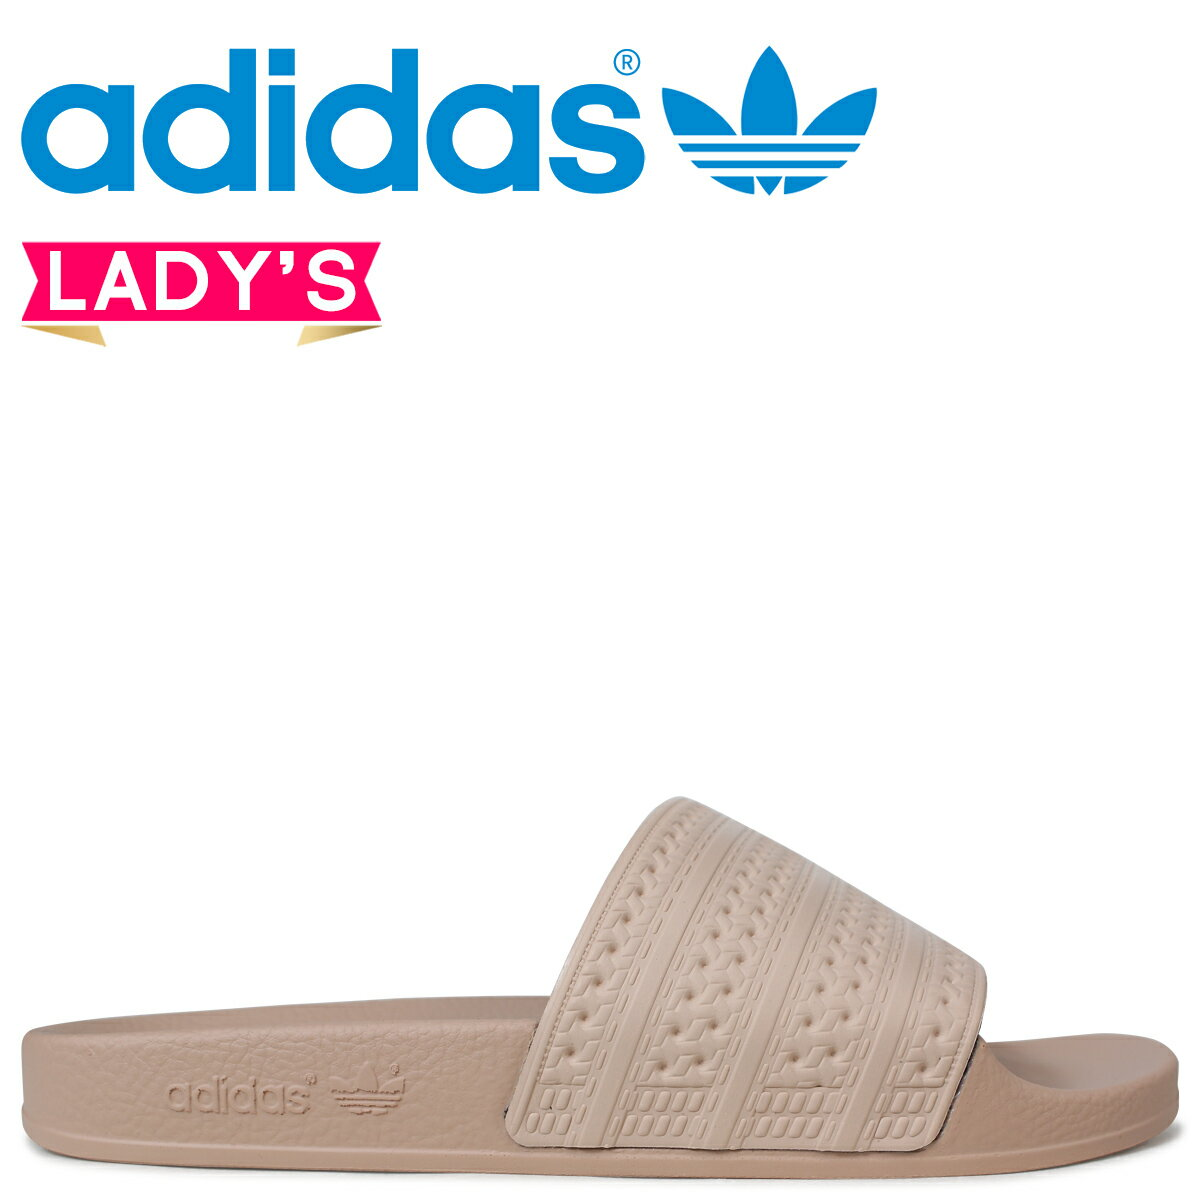 adidas Originals アディレッタ アディダス レディース サンダル シャワーサンダル WOMENS ADILETTE SLIDES CQ2235 ピンクベージュ [予約商品 4/19頃入荷予定 新入荷]